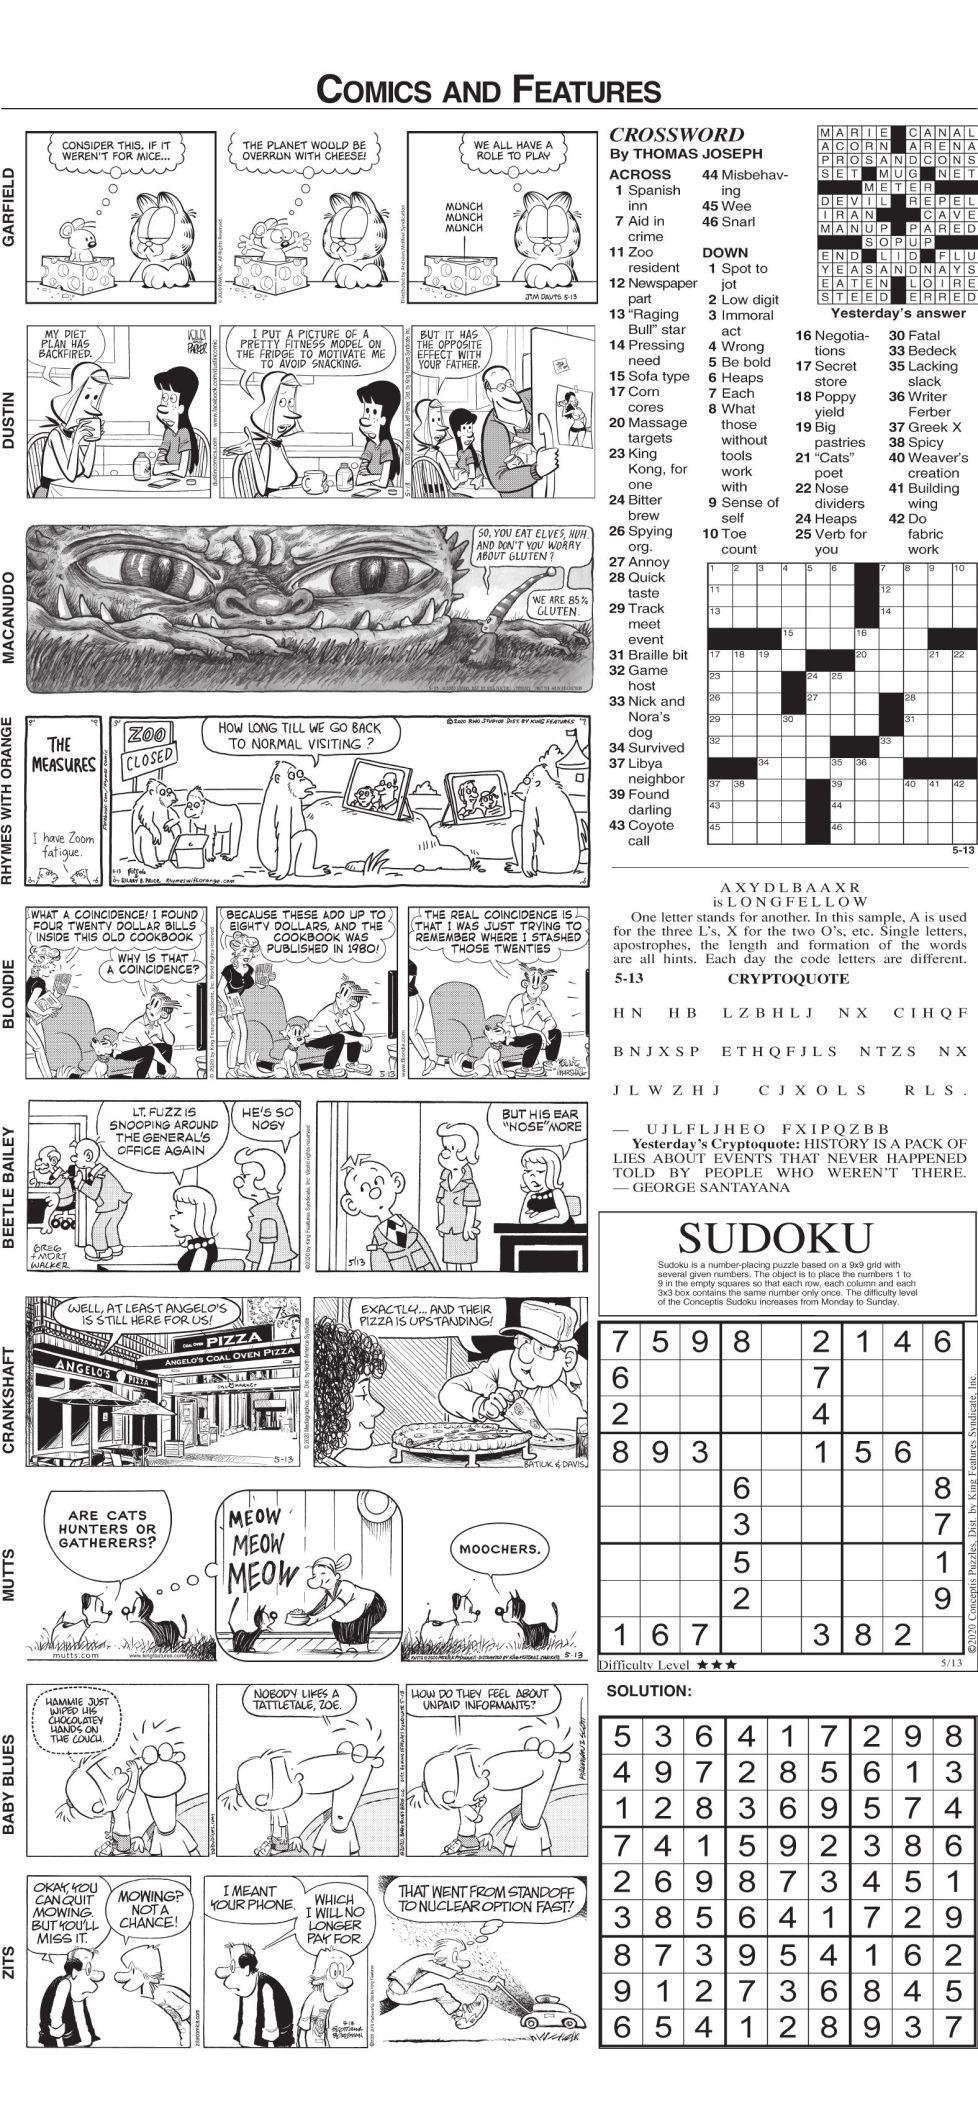 Comics Wednesday, May 13, 2020